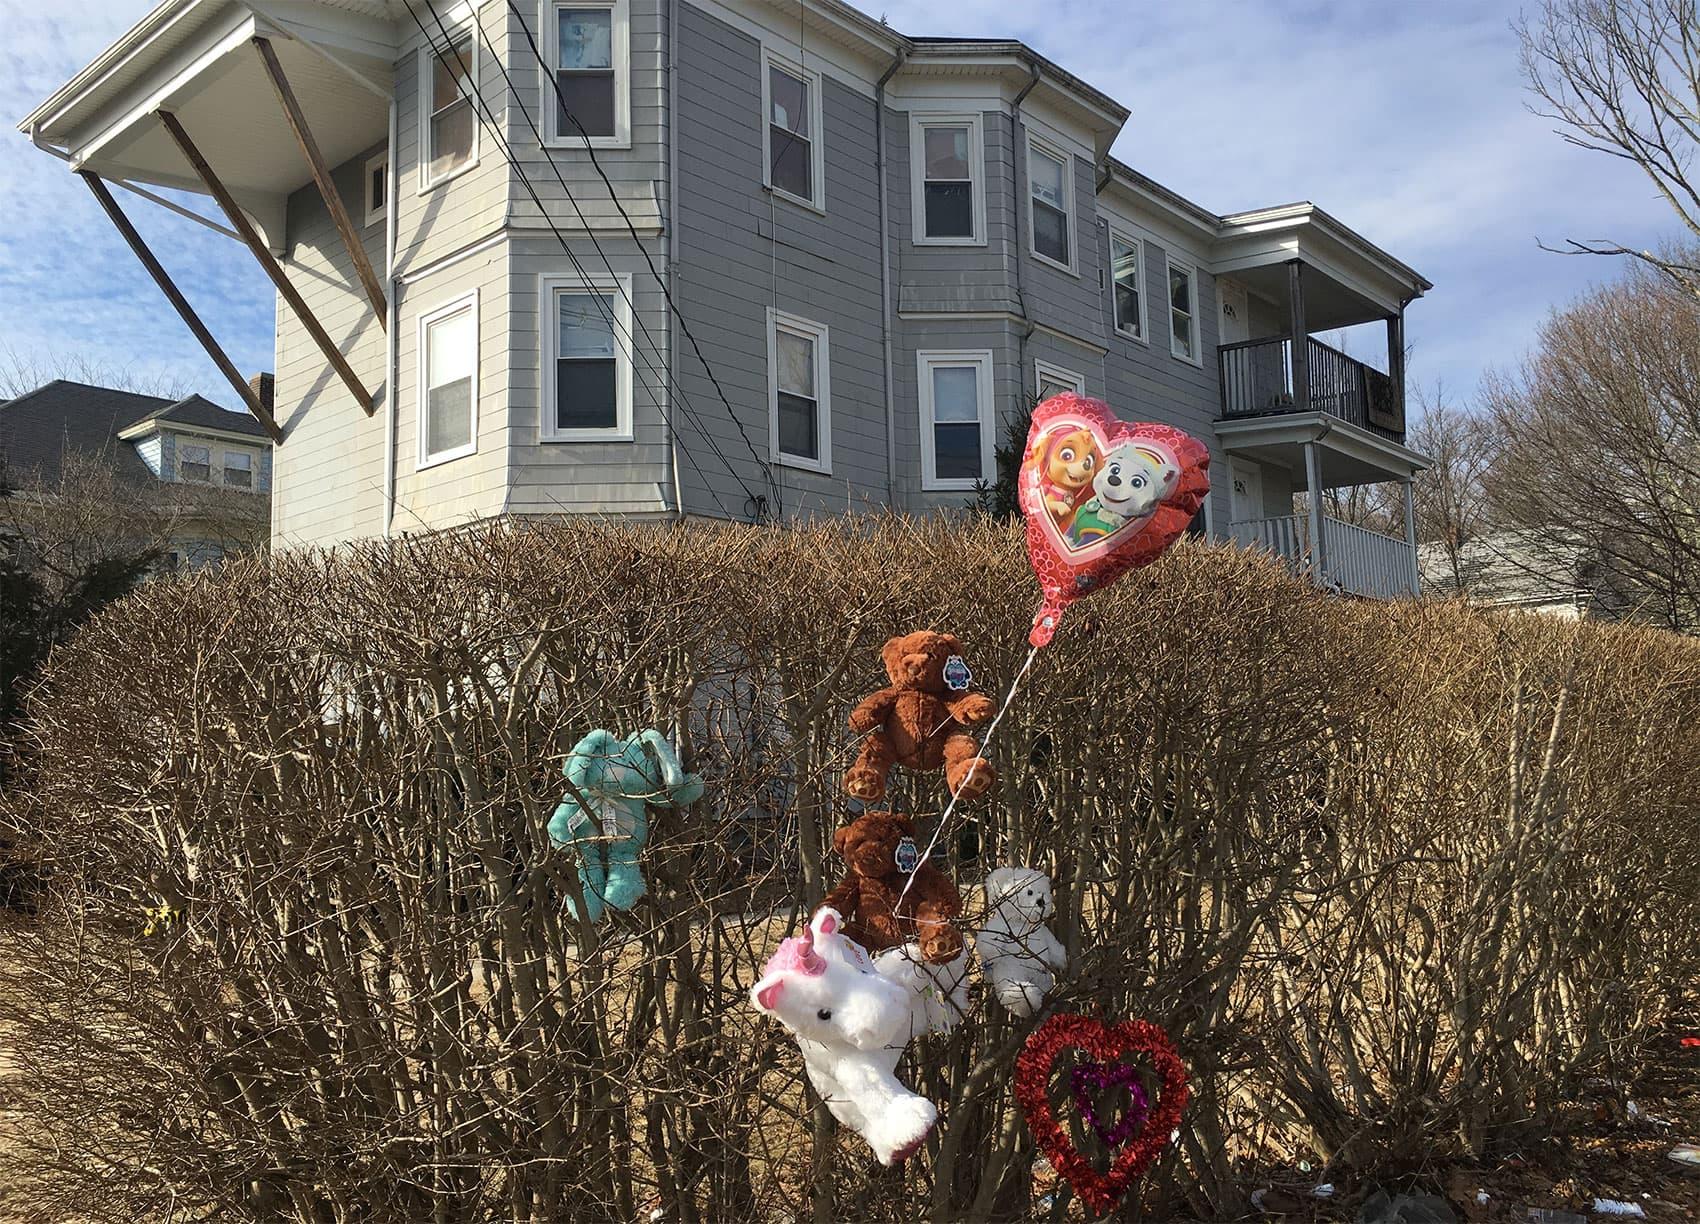 Balloons and stuffed animals are left outside 247 Prospect St., in Brockton, where the slain children were found. (Bruce Gellerman/WBUR)